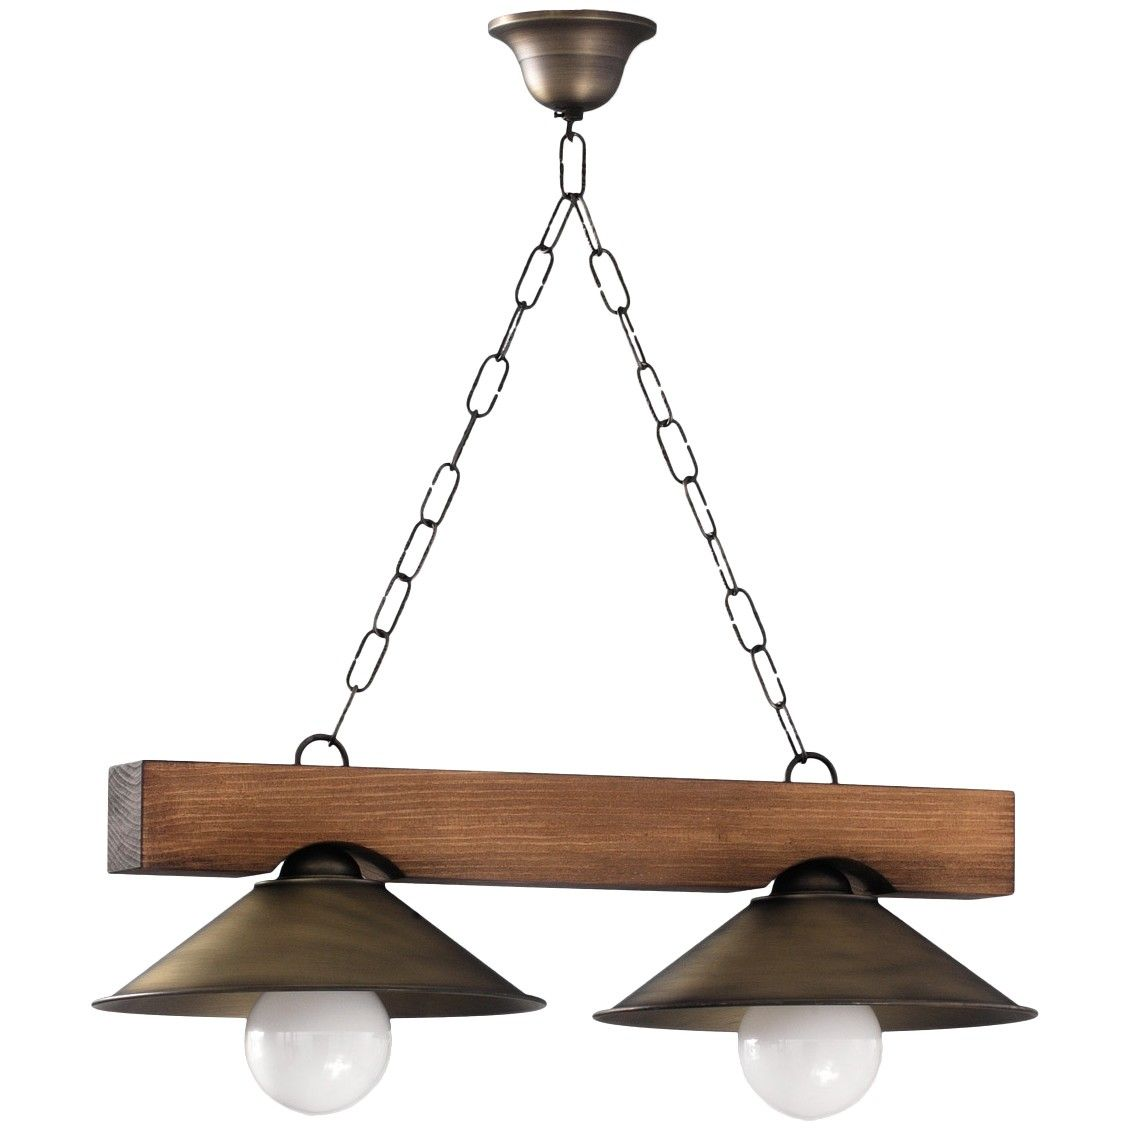 L mpara de techo r stica viga de madera 2 luces - Techo de madera ...